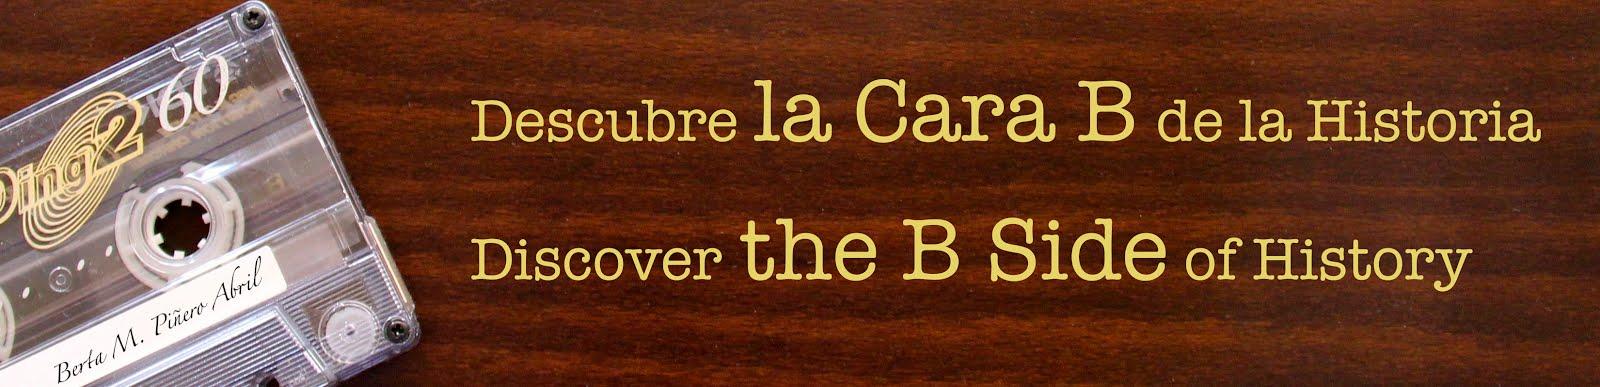 DESCUBRE LA CARA B             /           DISCOVER THE REVERSE SIDE